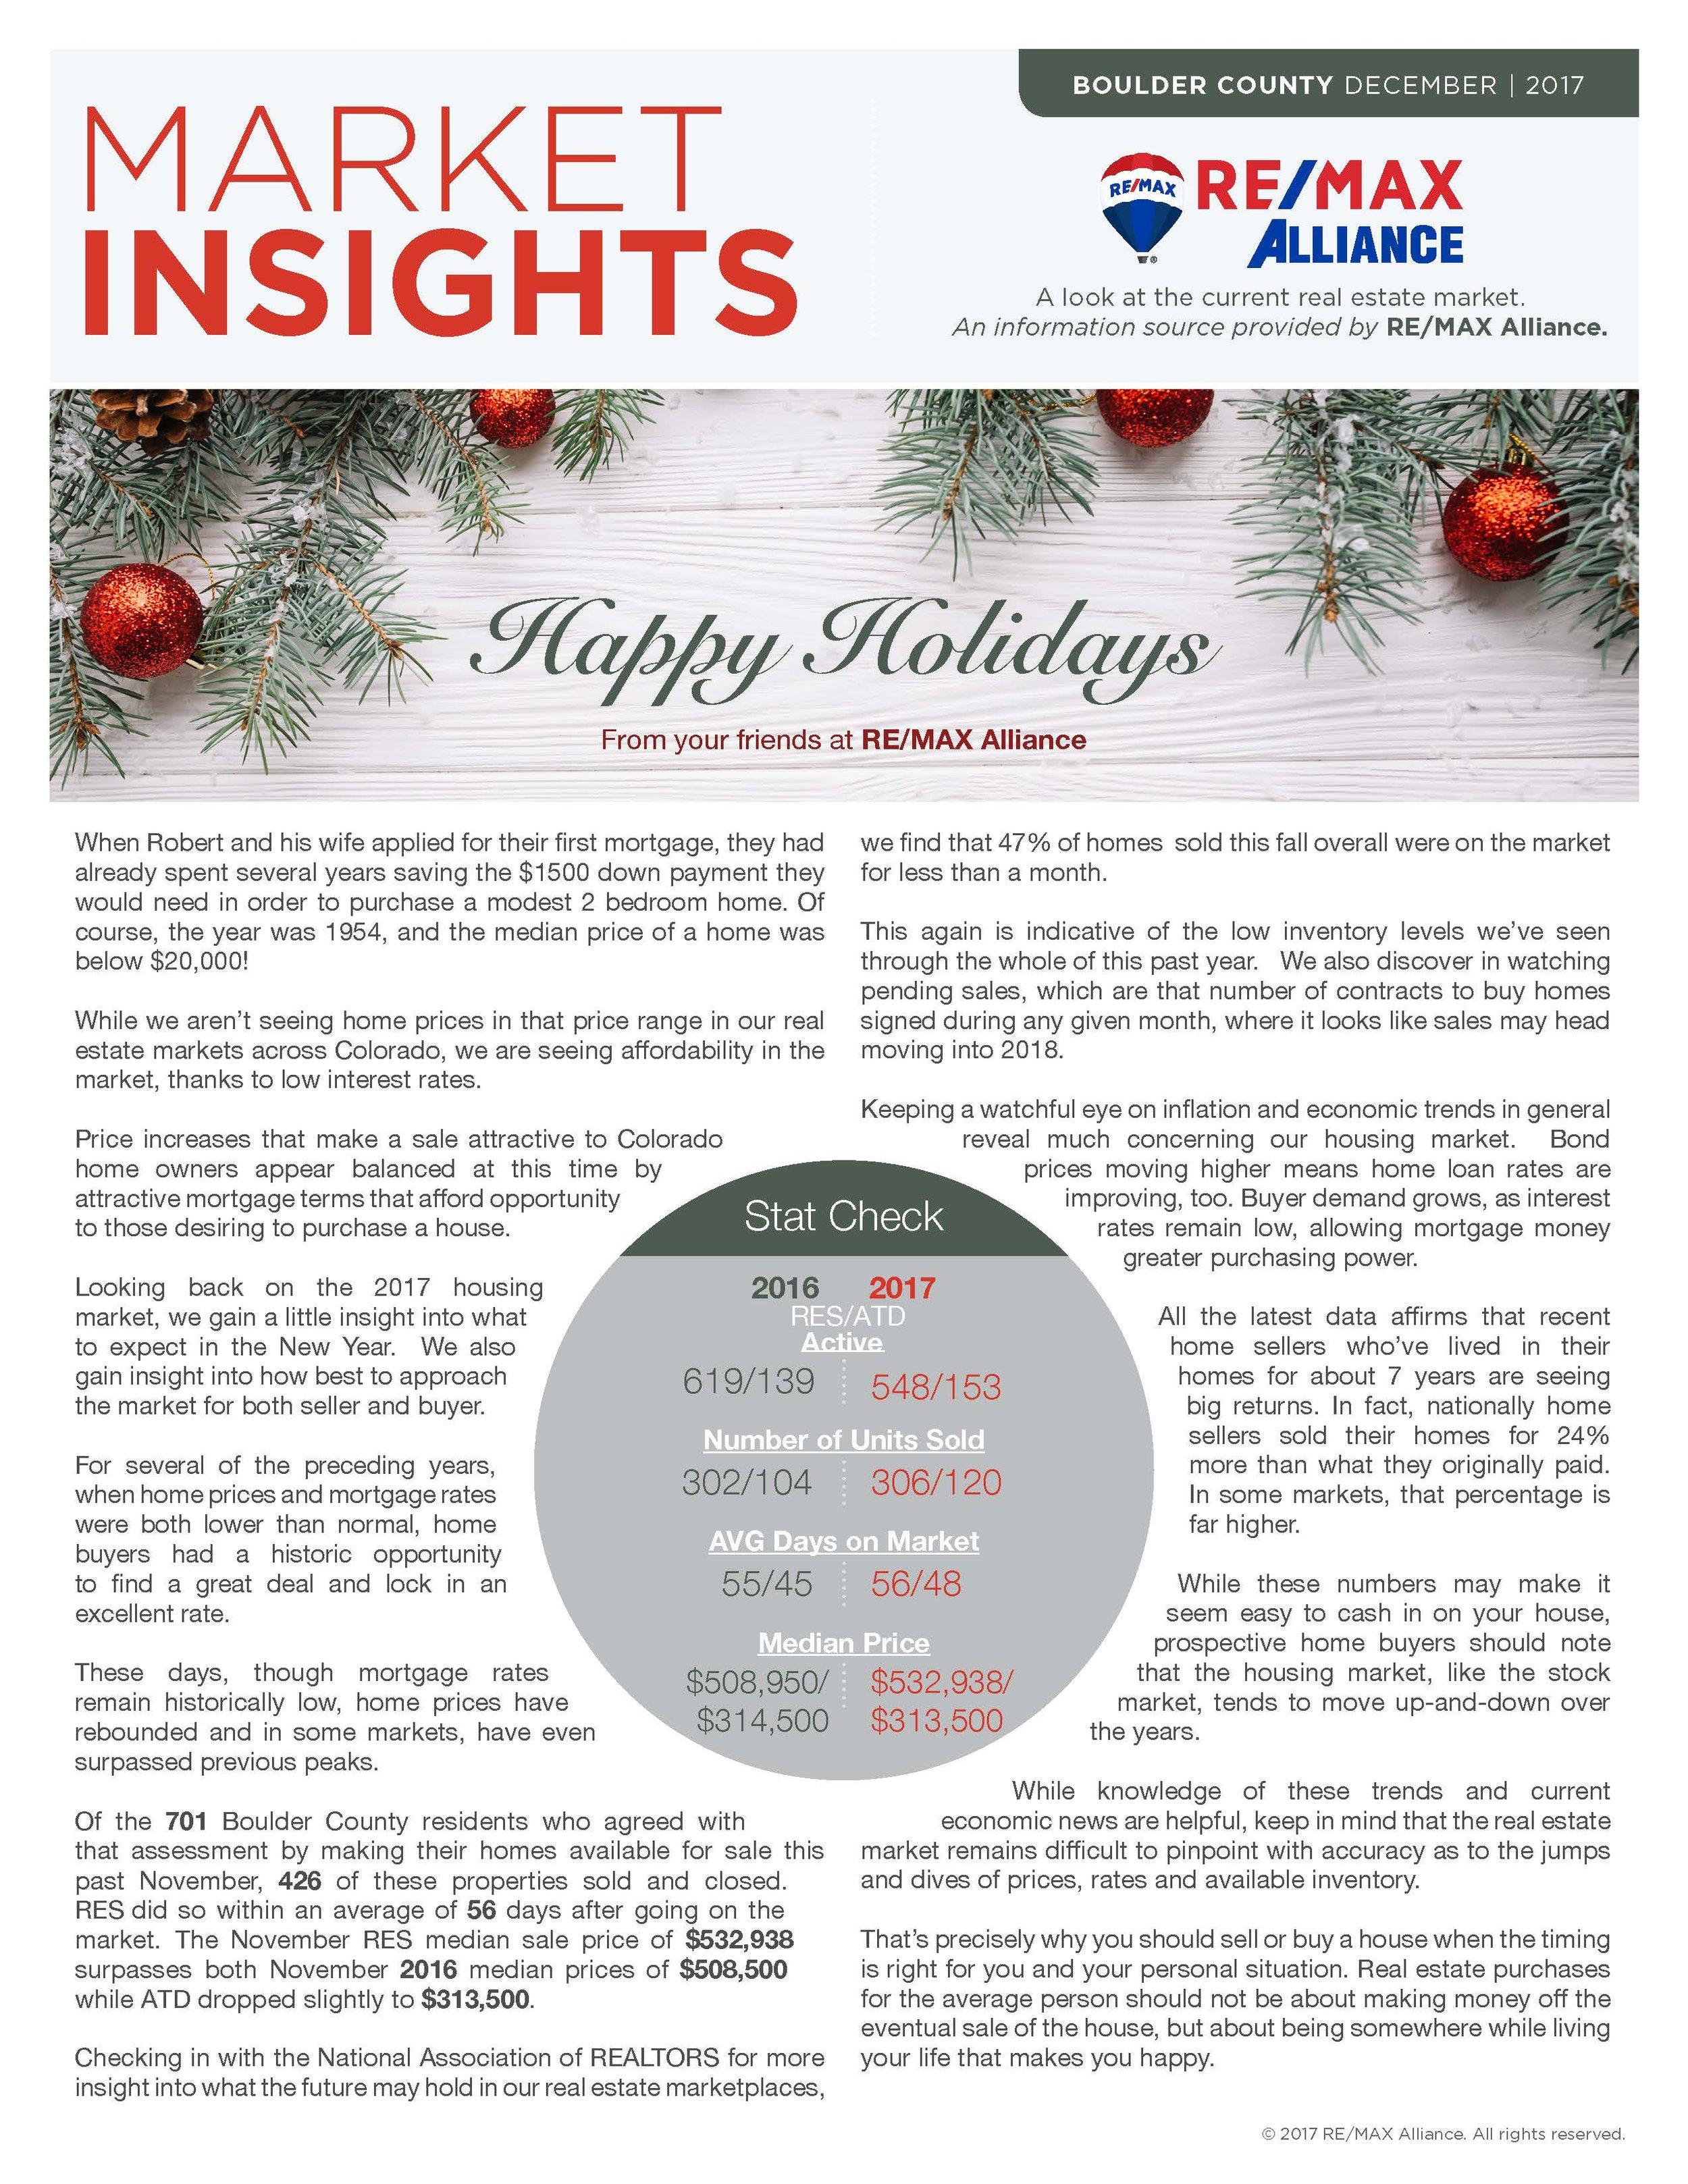 market-insight_12.17_boulder-county-edited[24516].jpg